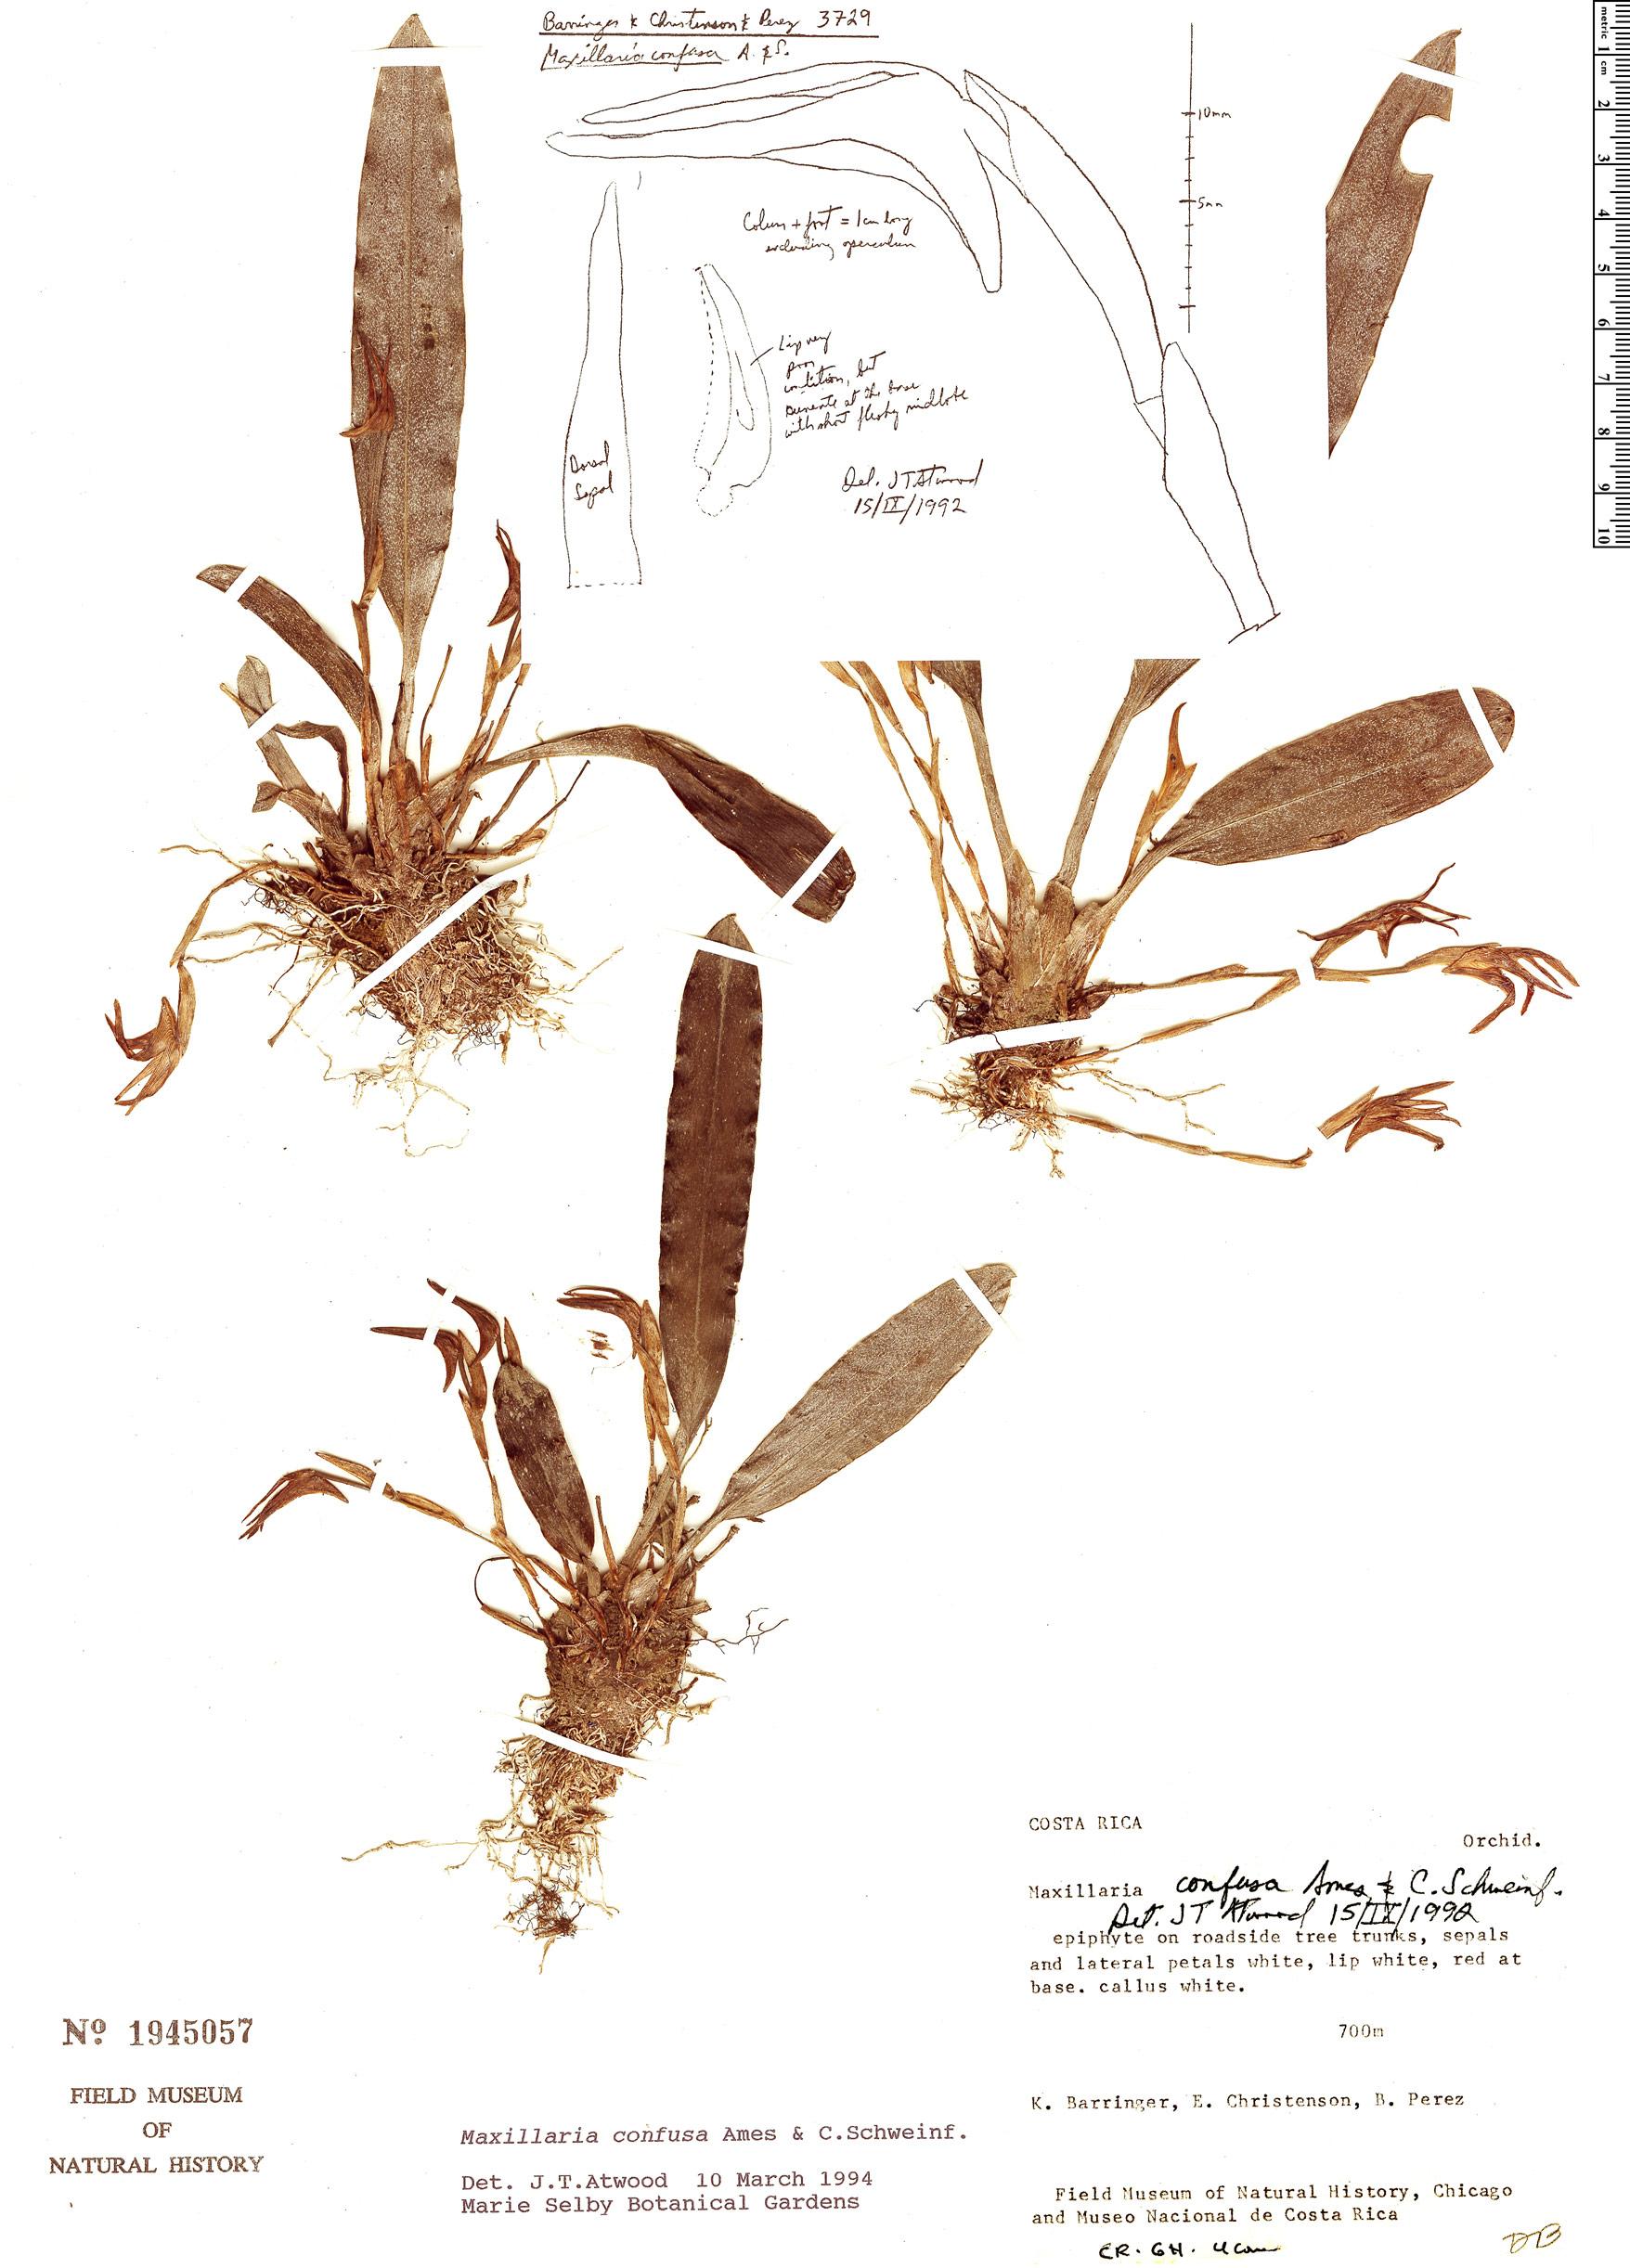 Specimen: Maxillaria confusa